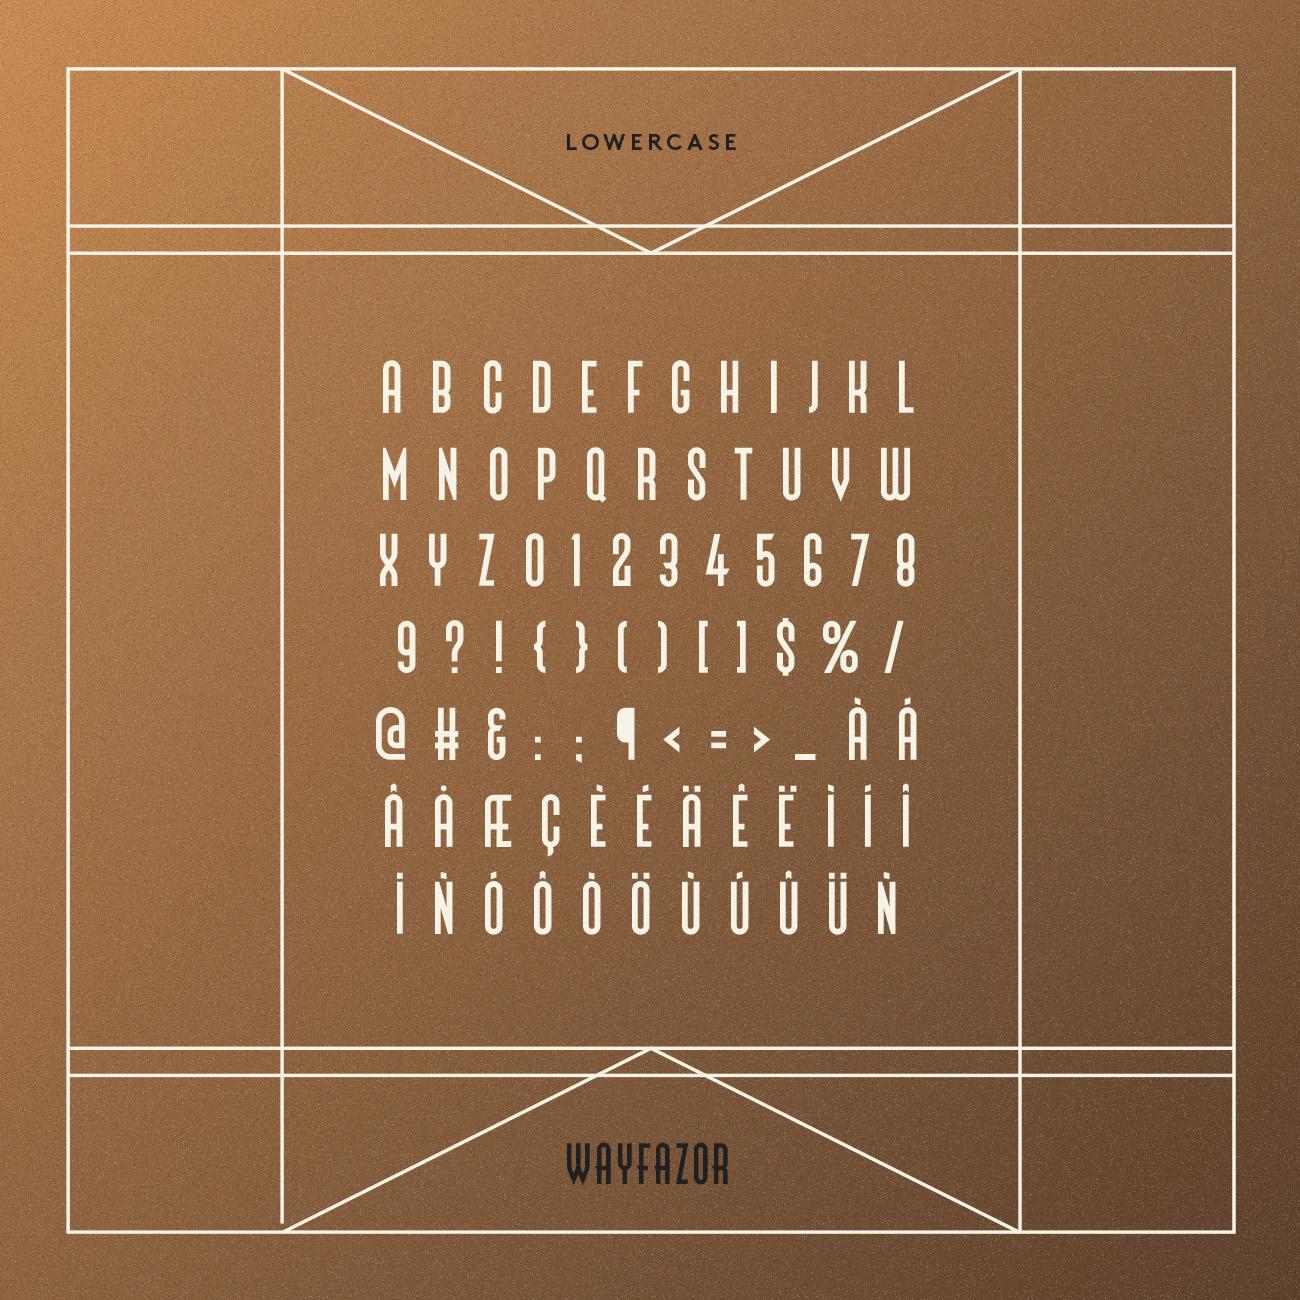 wayfazor display retro font type